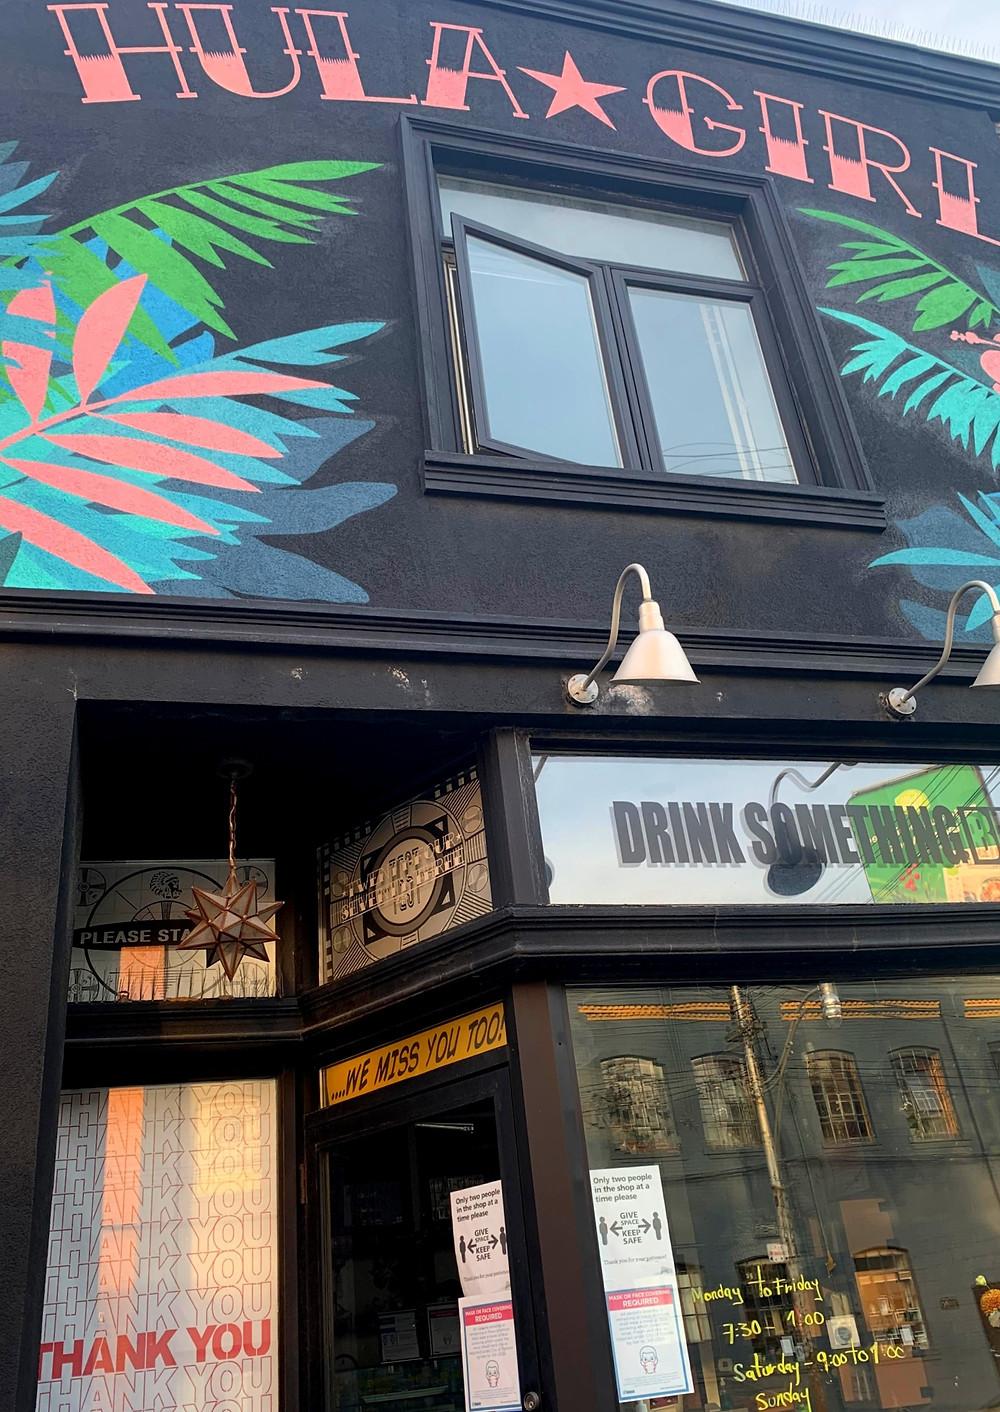 Hula Girl Espresso Boutique Junction Triangle coffee shop near Dundas West station